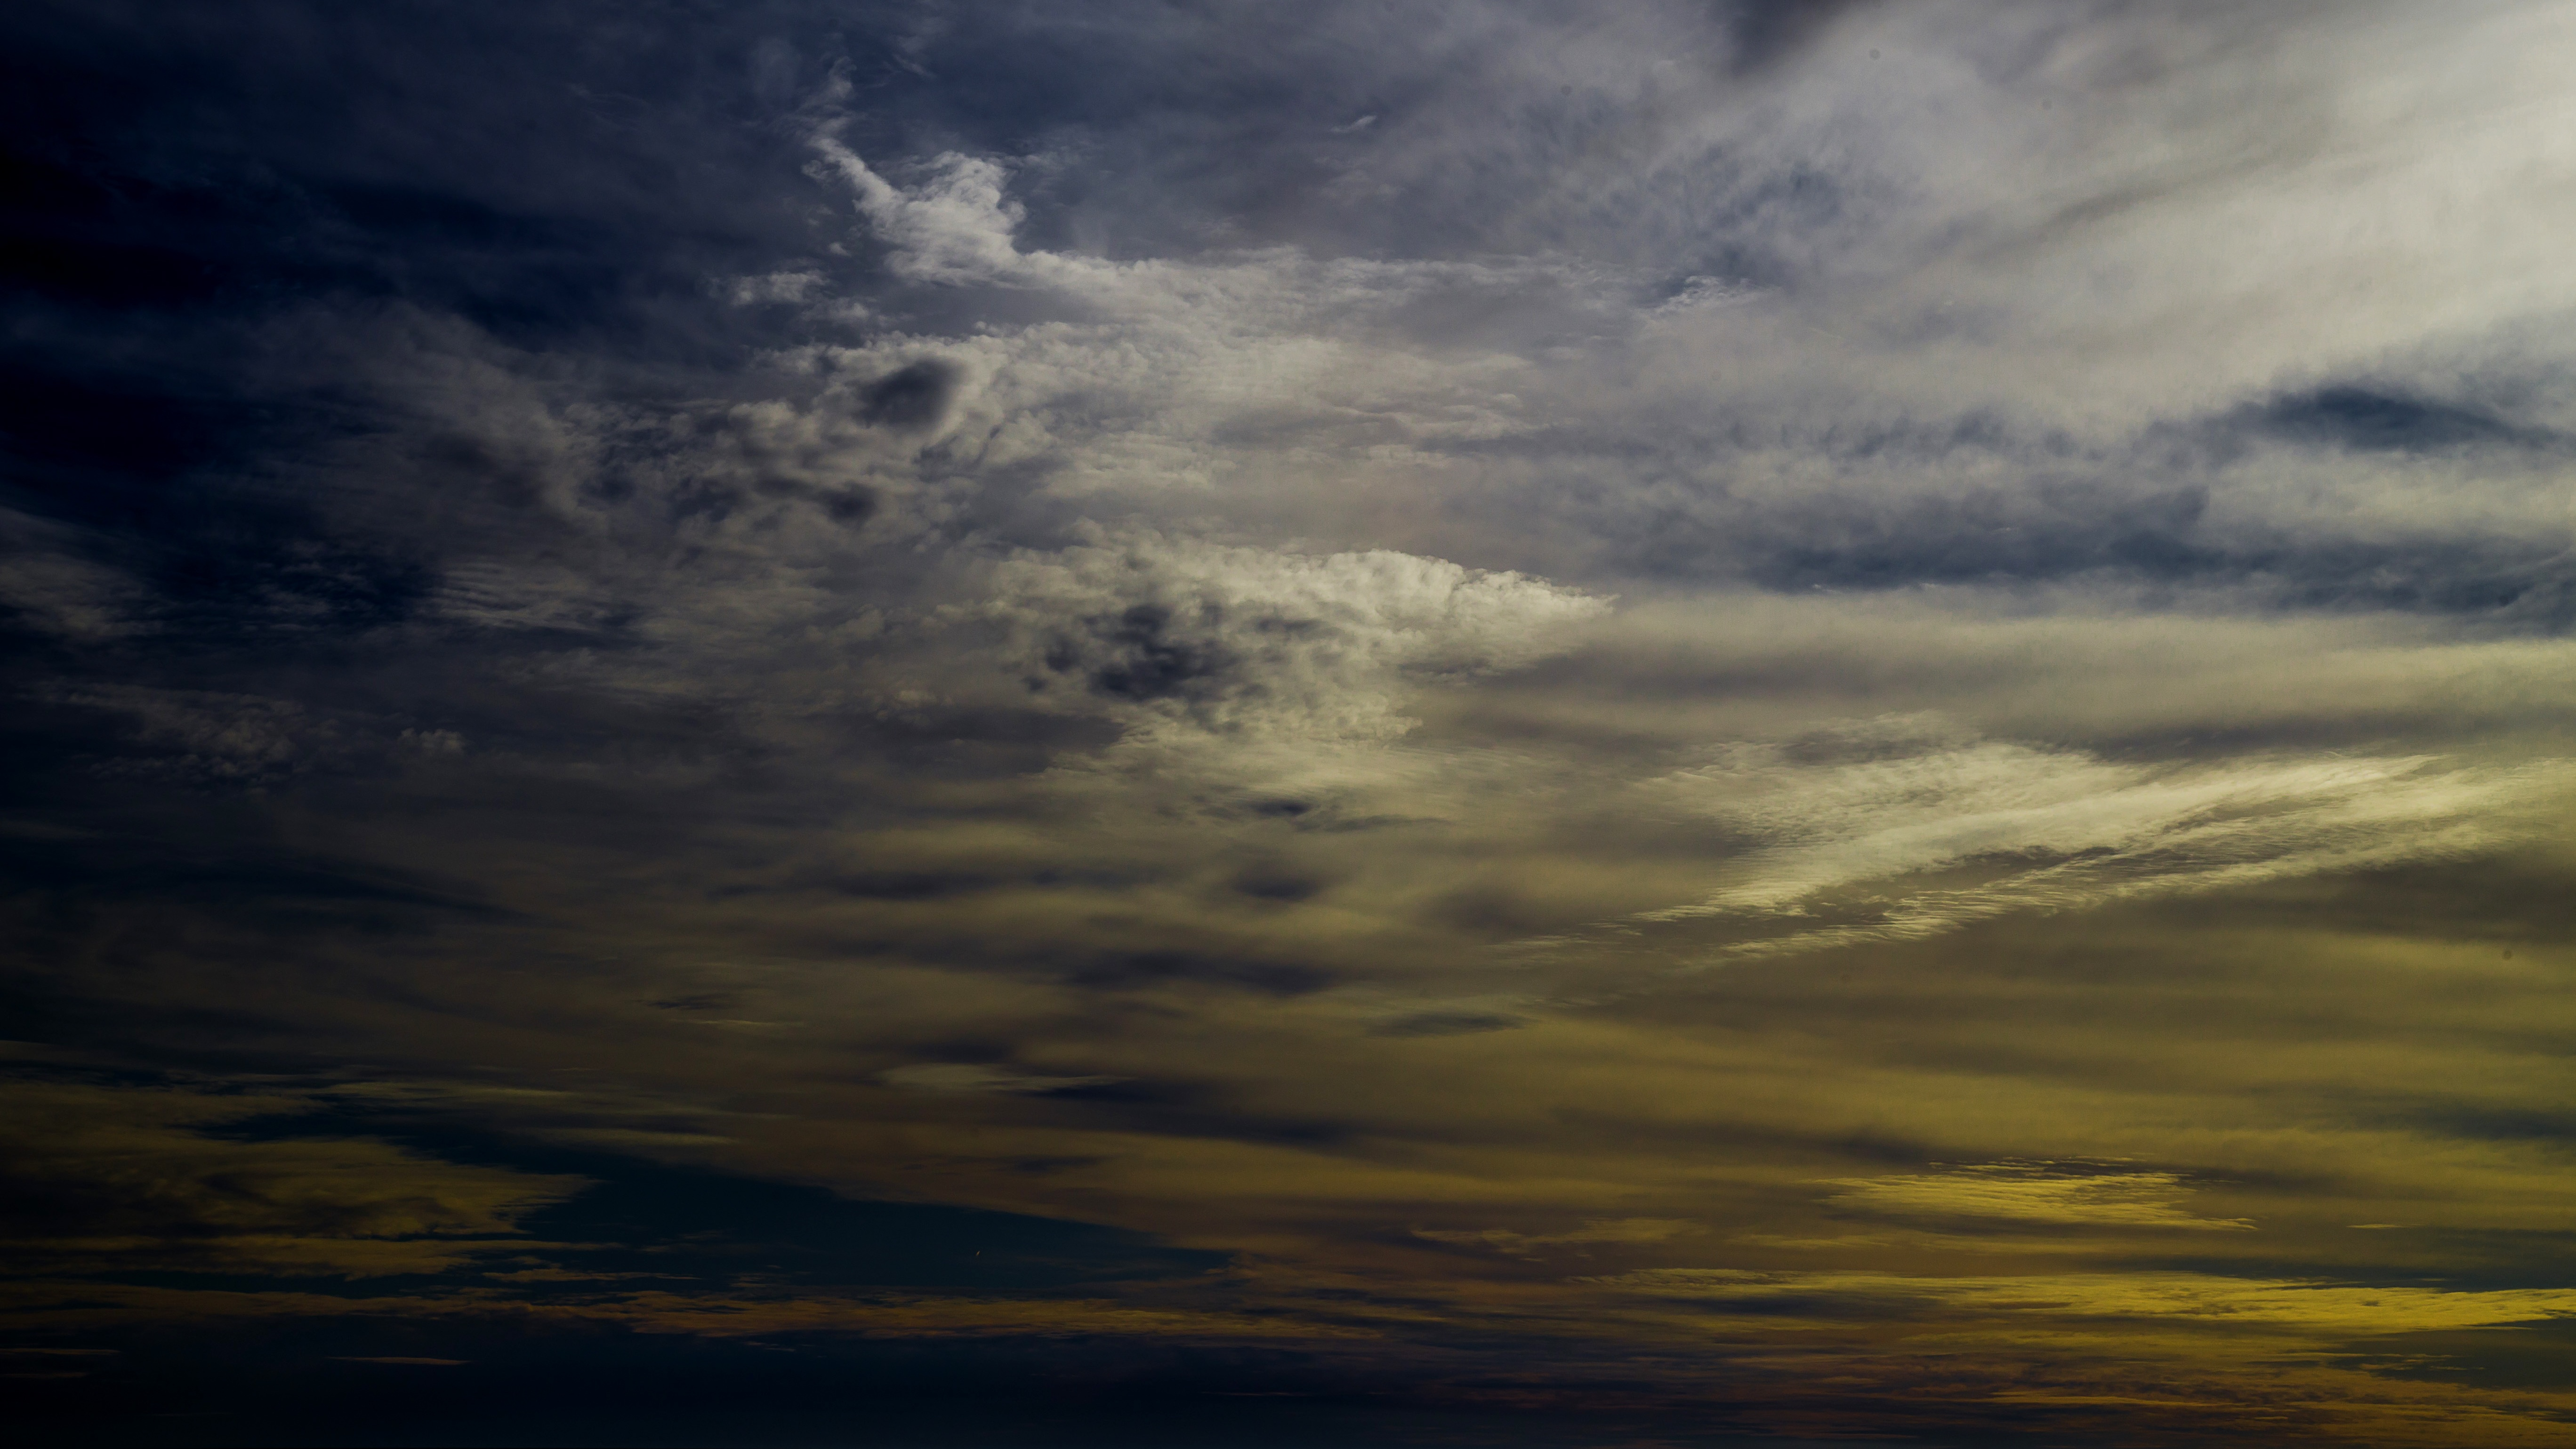 Cloudy sky, Cloud, Cloudy, Gray, Sky, HQ Photo